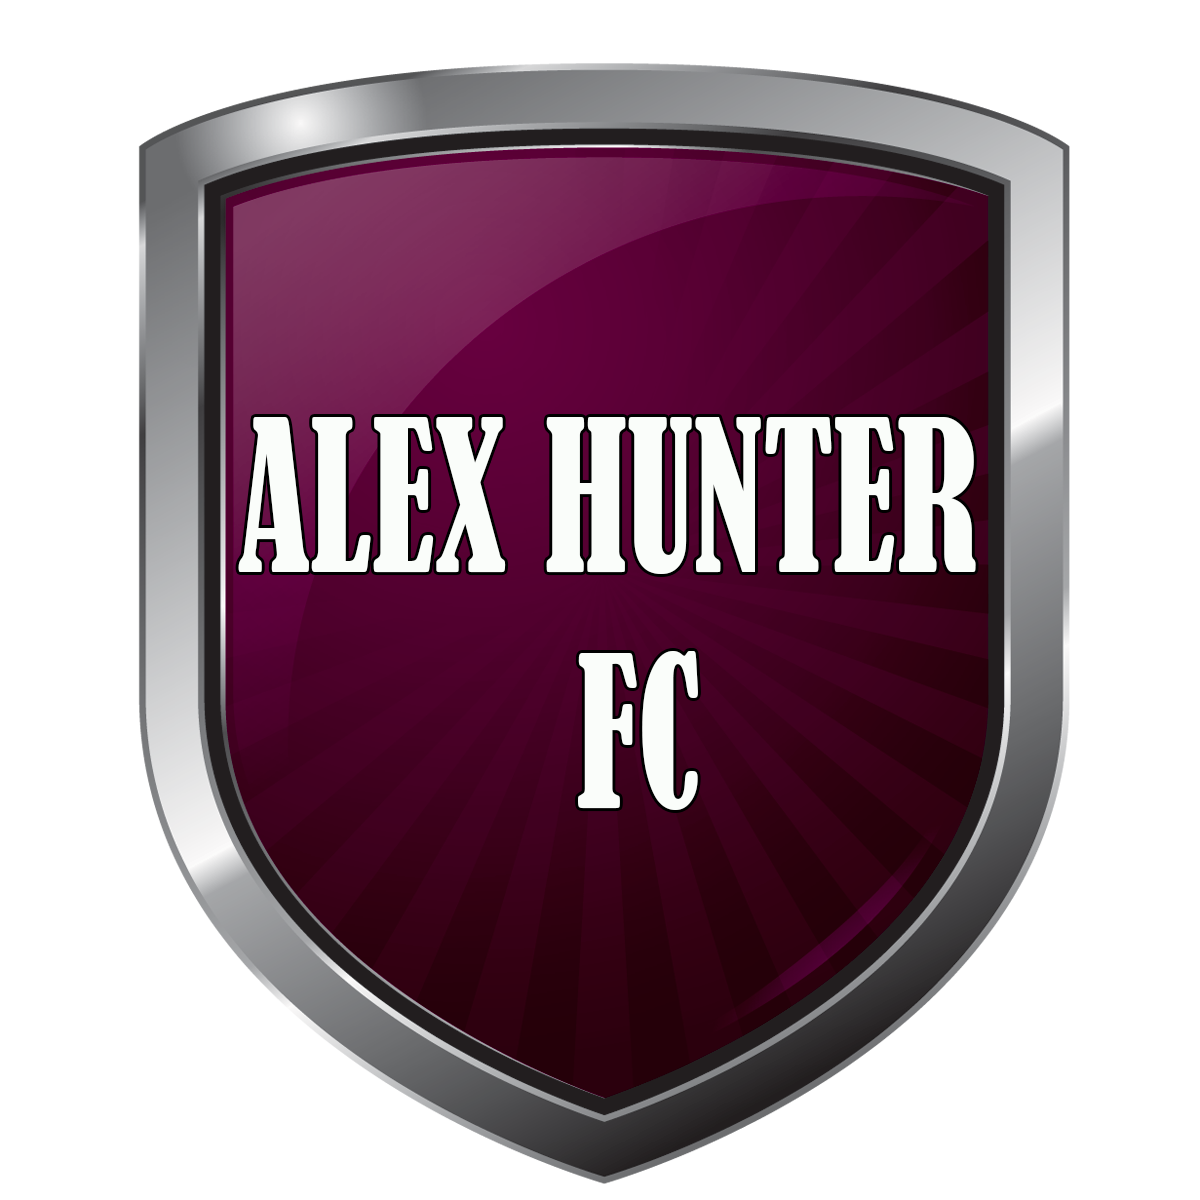 ALEXHUNTER FC